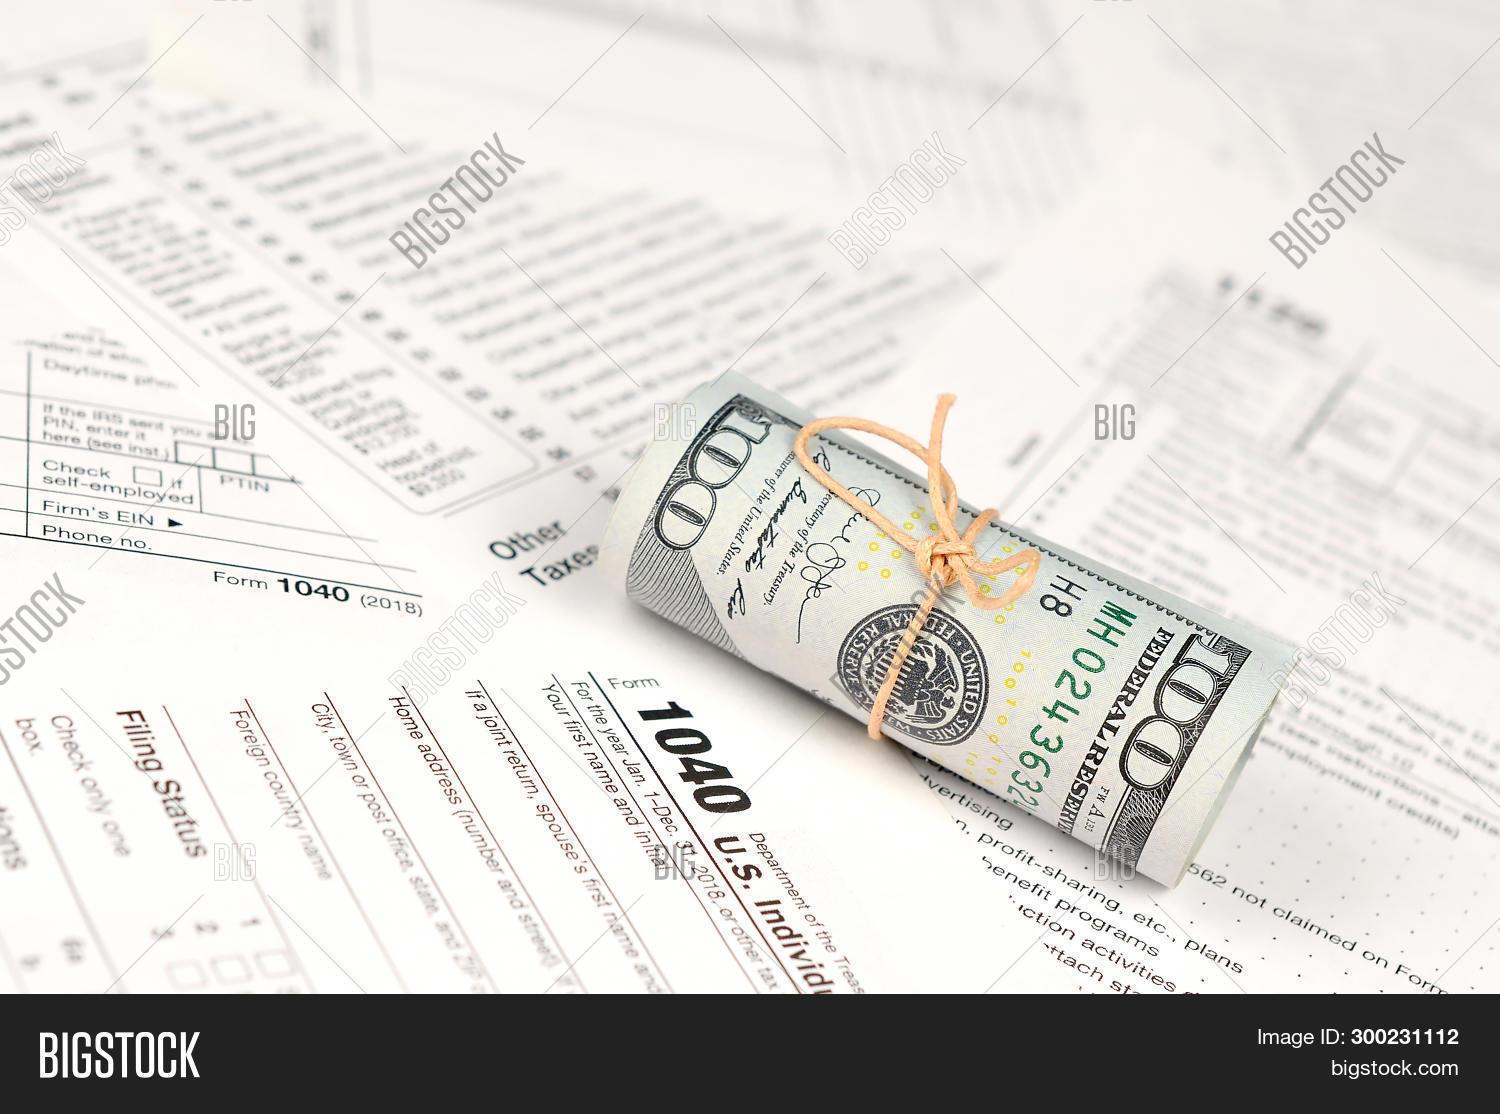 1040 Individual Income Image & Photo (Free Trial)   Bigstock